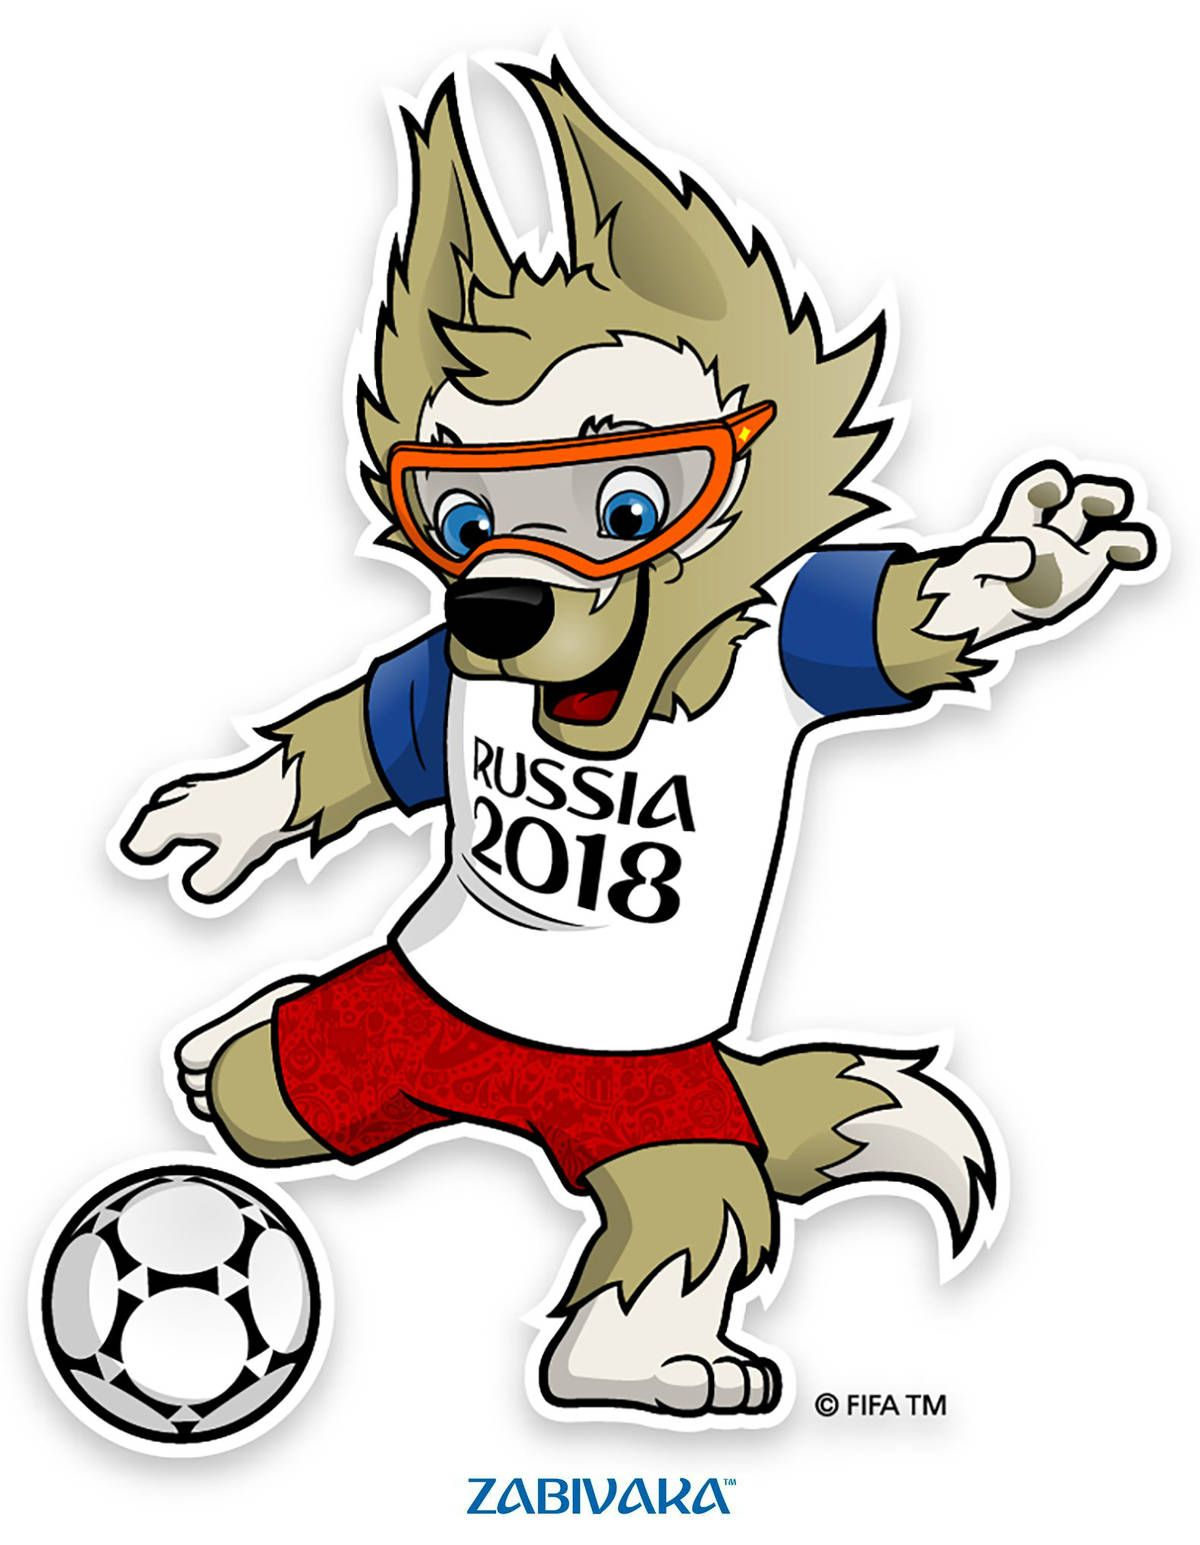 Das Panini WM 2018 Sticker.